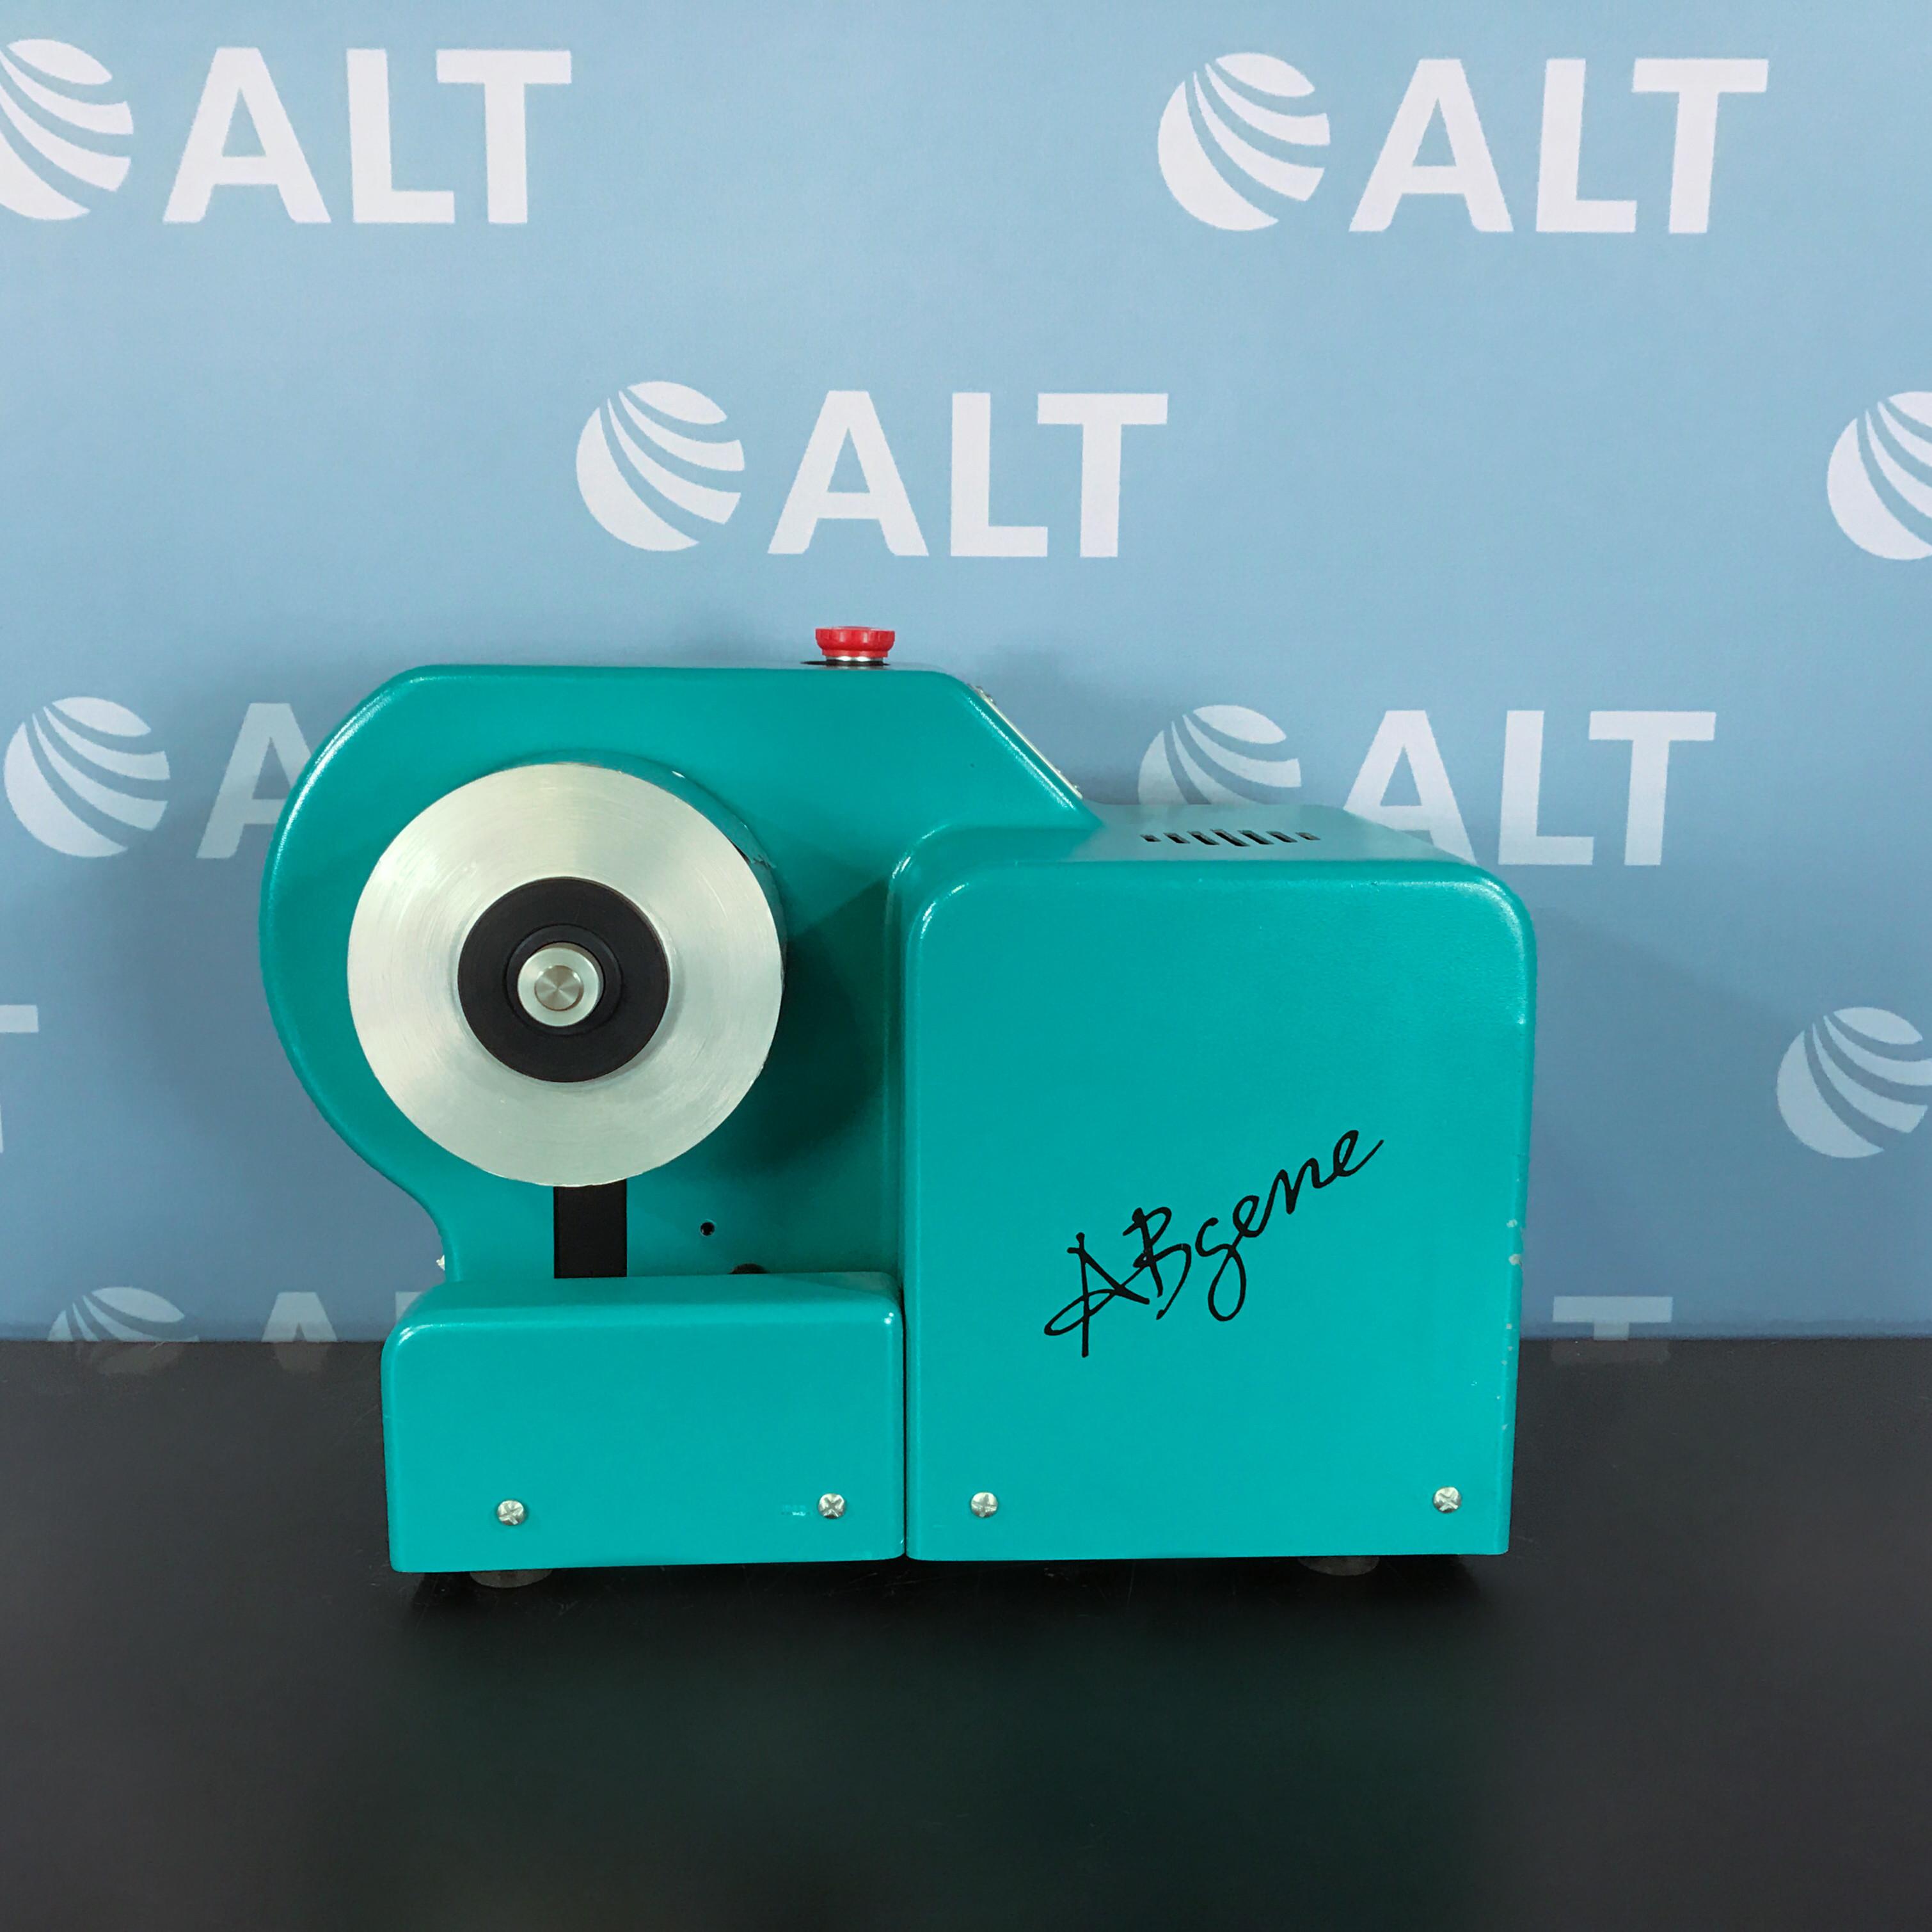 ABgene ALPS-300 Microplate Sealer Image